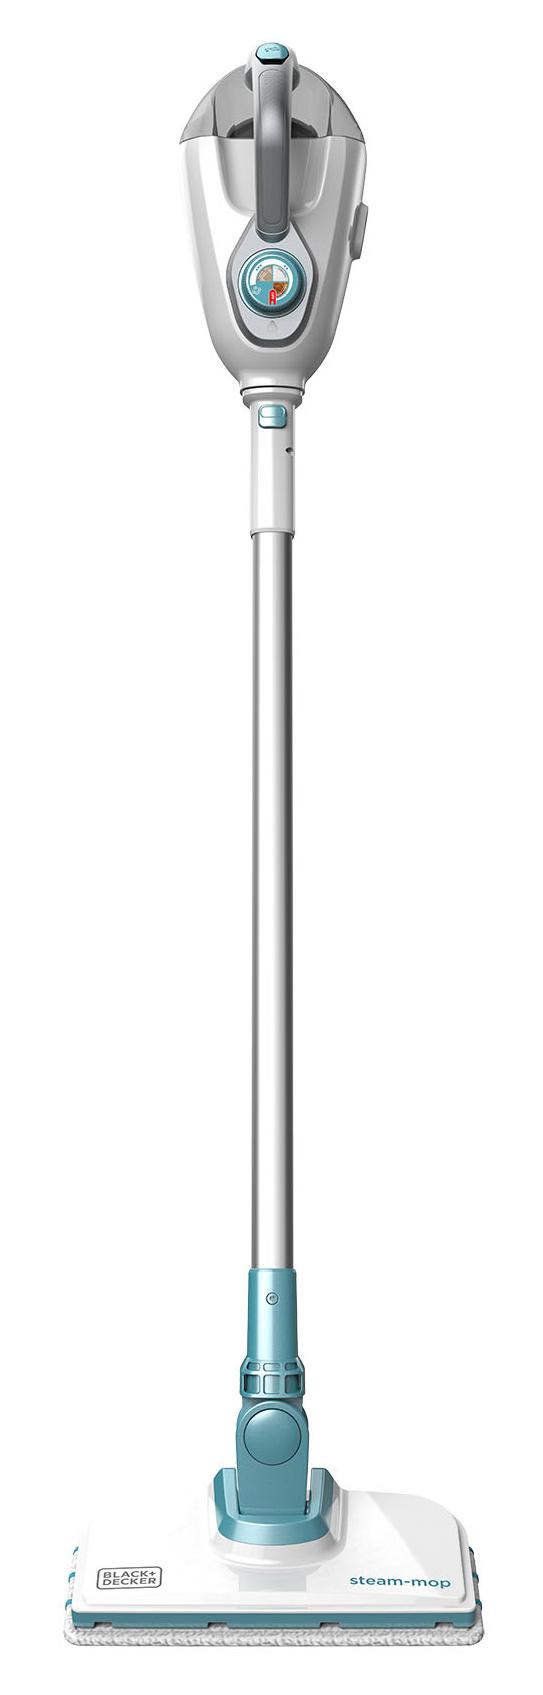 Bl&Decker FSMH1300FX-QSHuishoudelijk